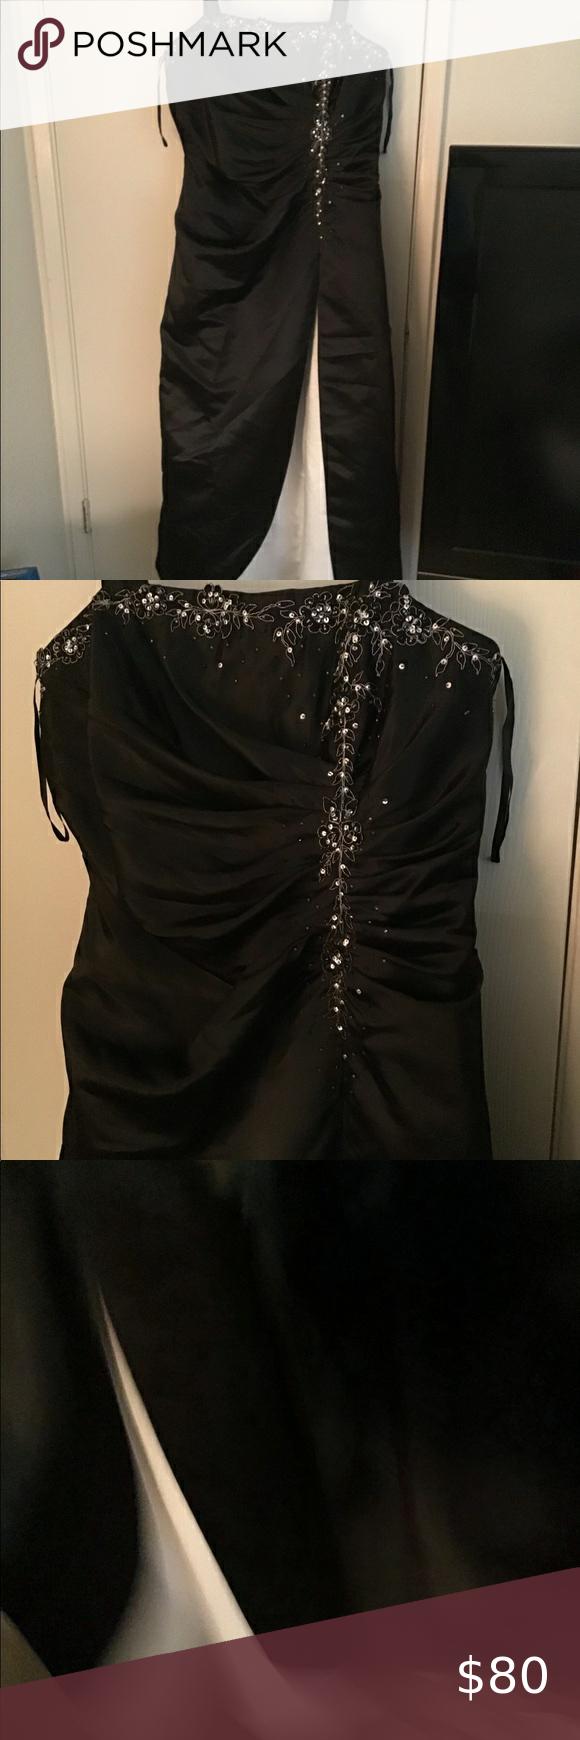 19+ Onyx nites dress ideas